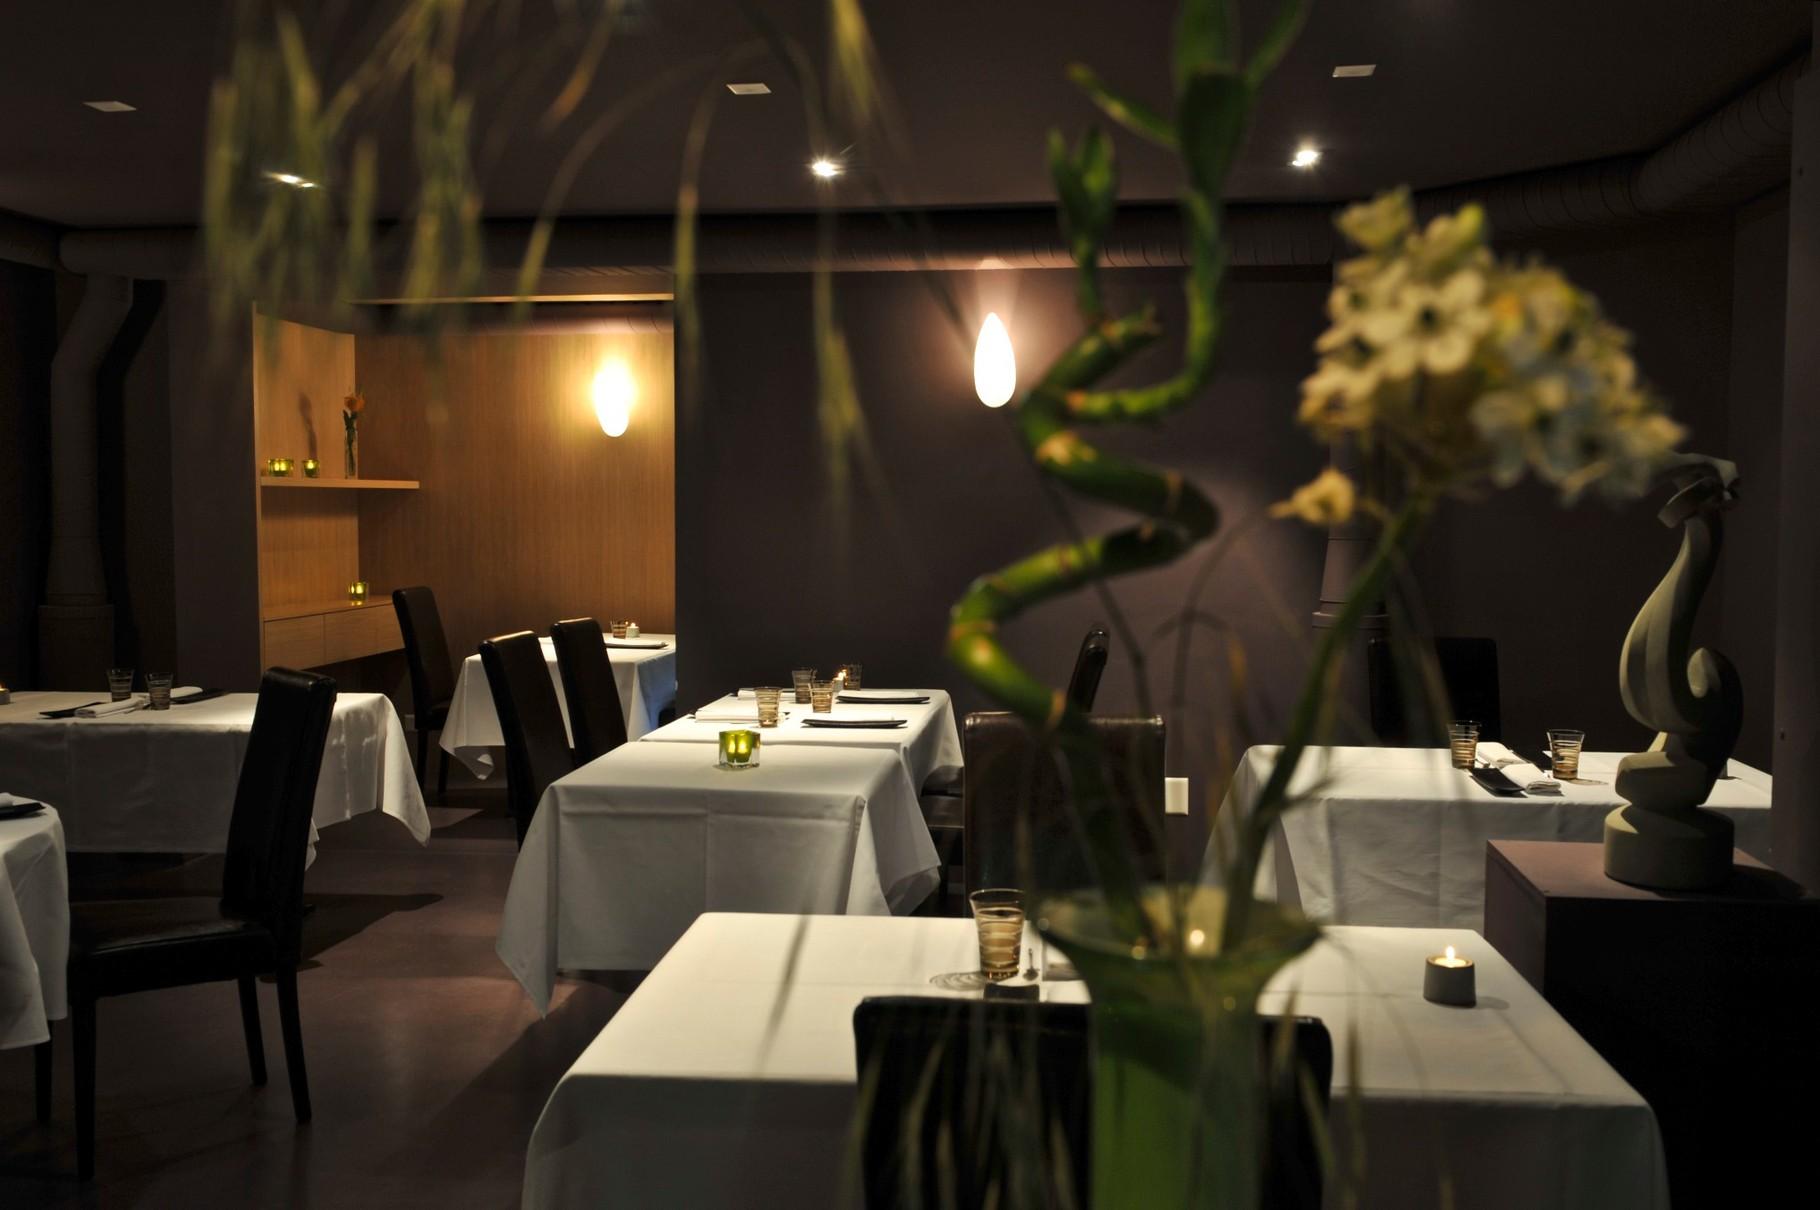 Restaurant La Tavola Pronta Bern, Architekt Bauherr